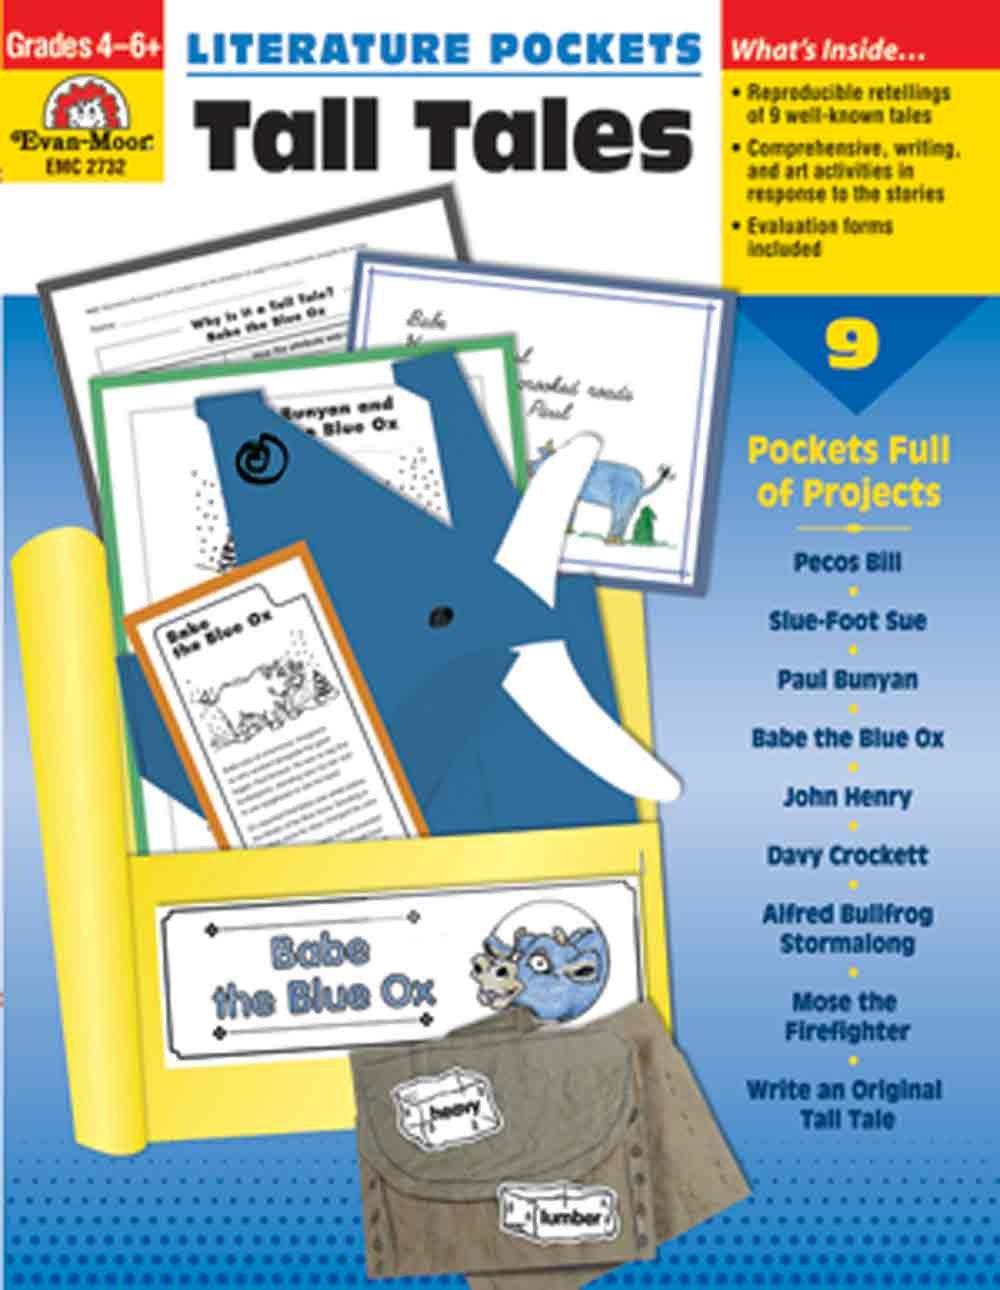 Literature Pockets Tall Tales, Grades 4-6+